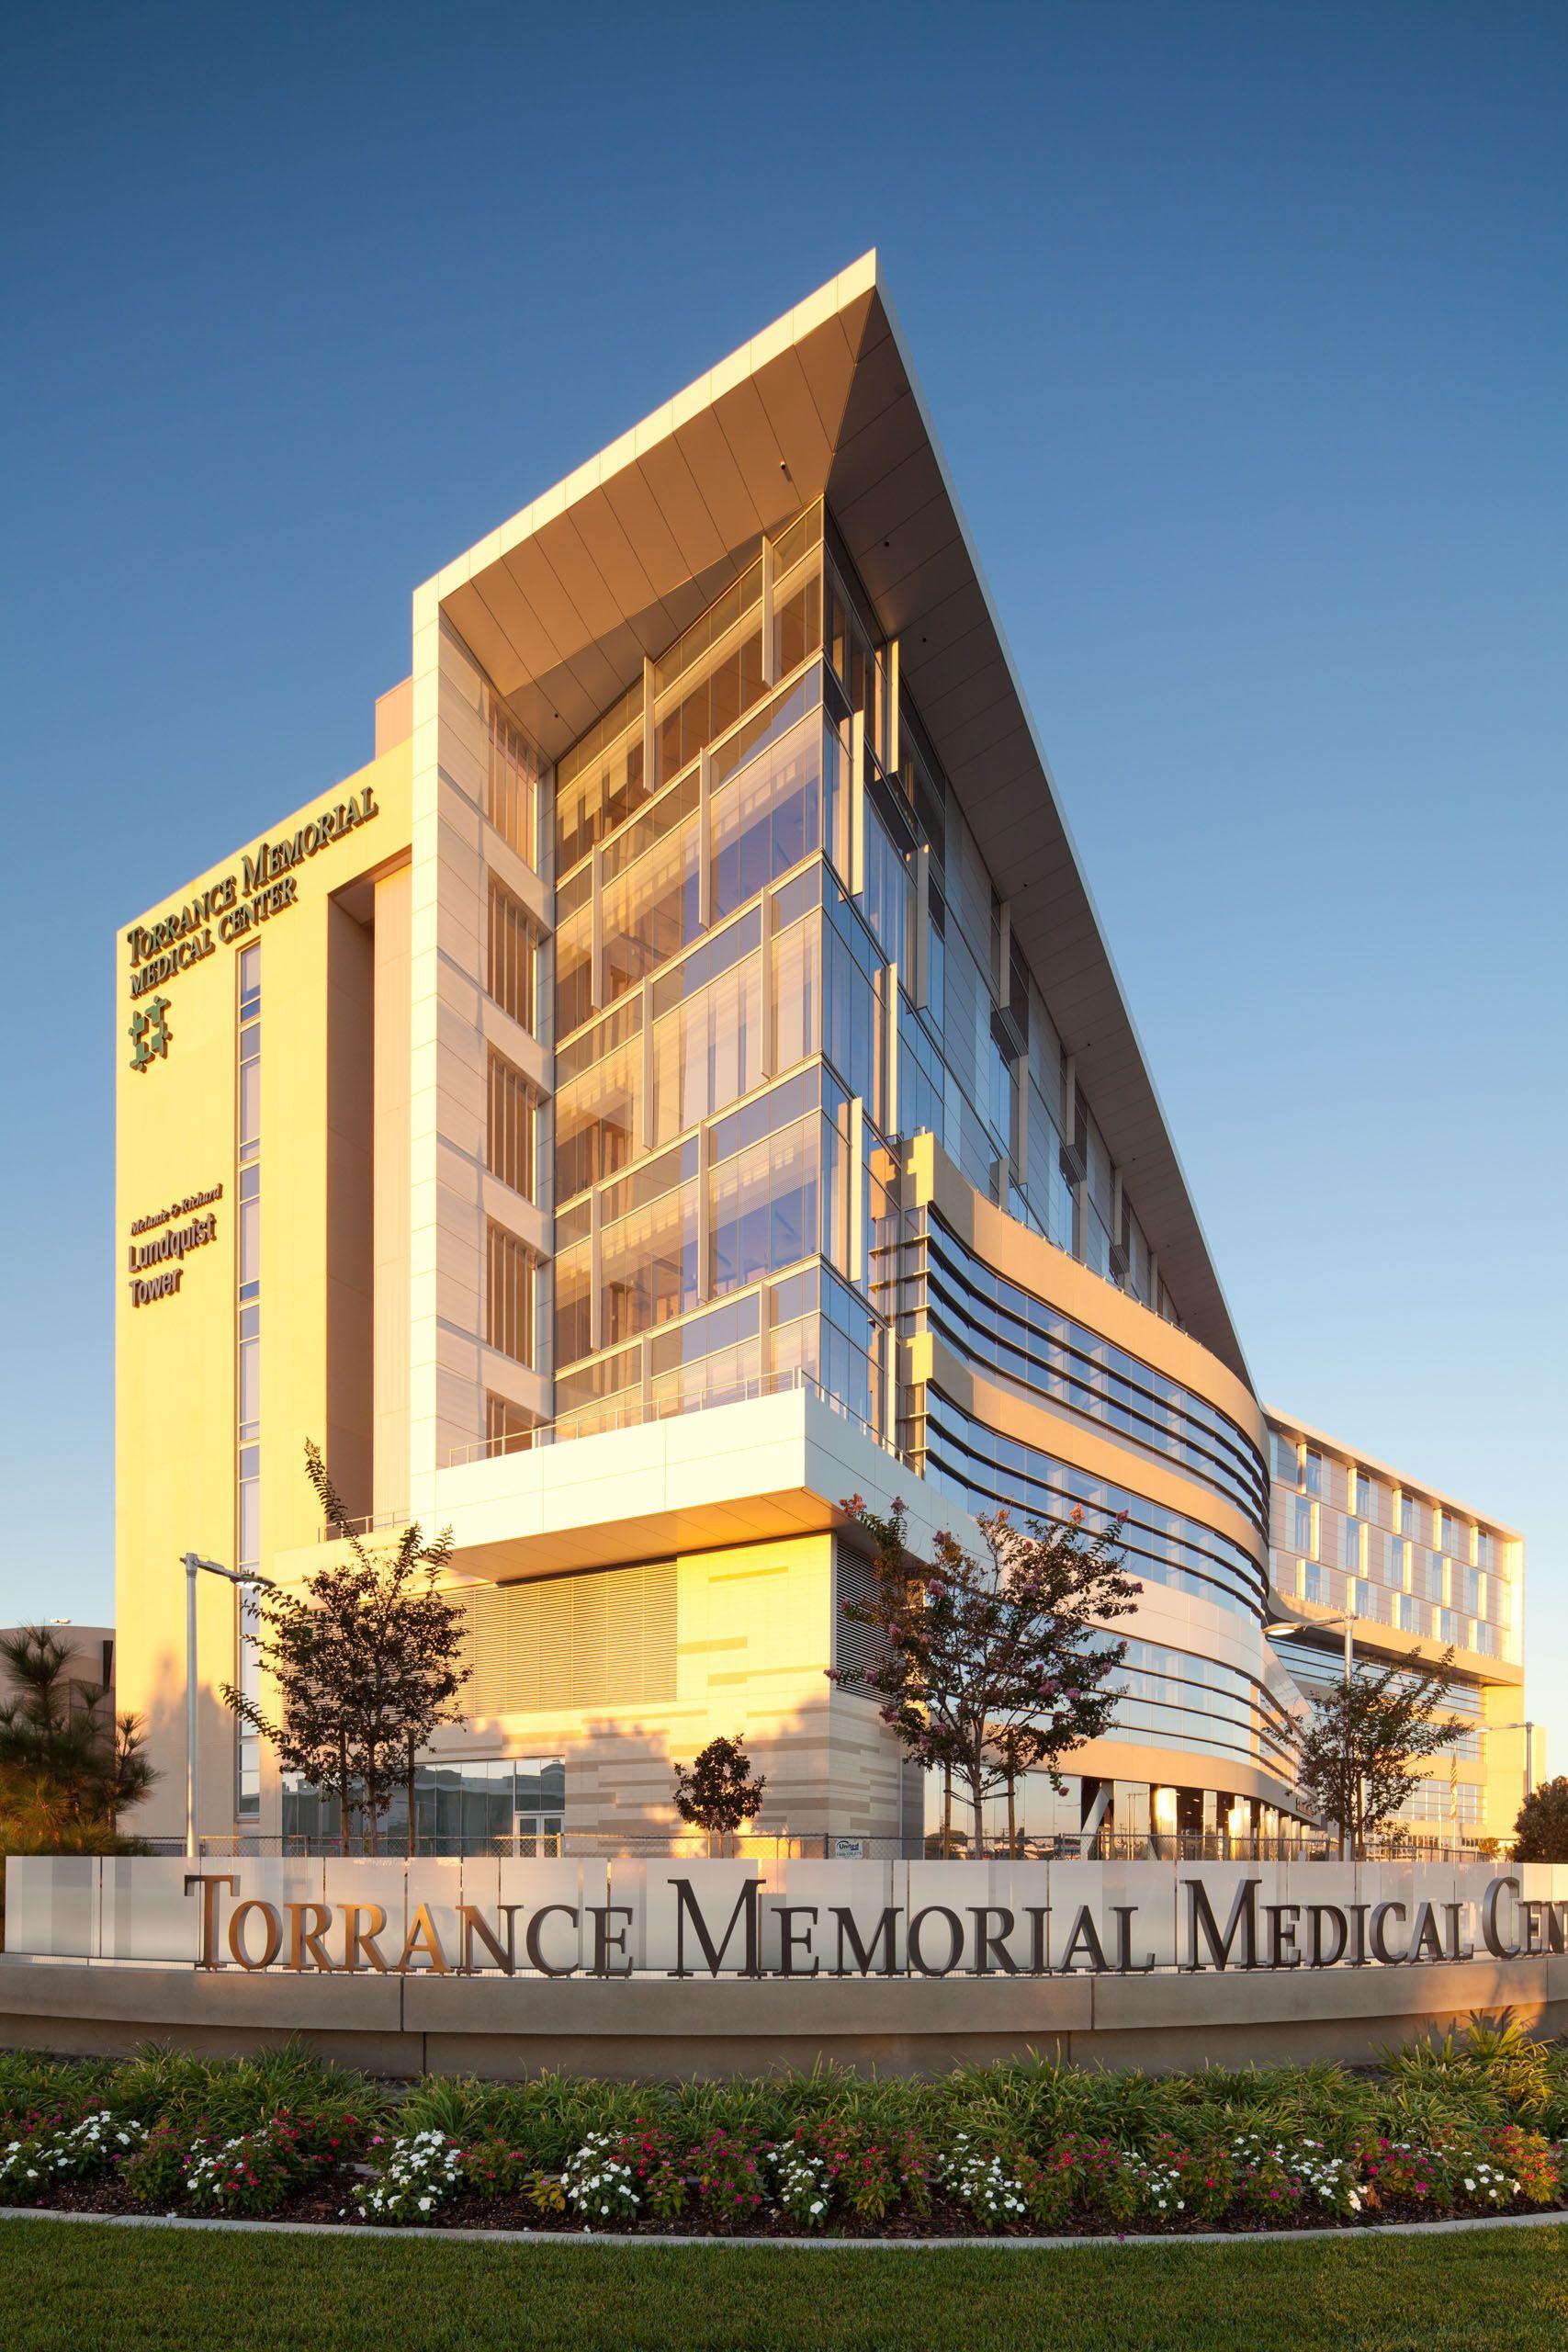 Torrance Memorial Medical Center